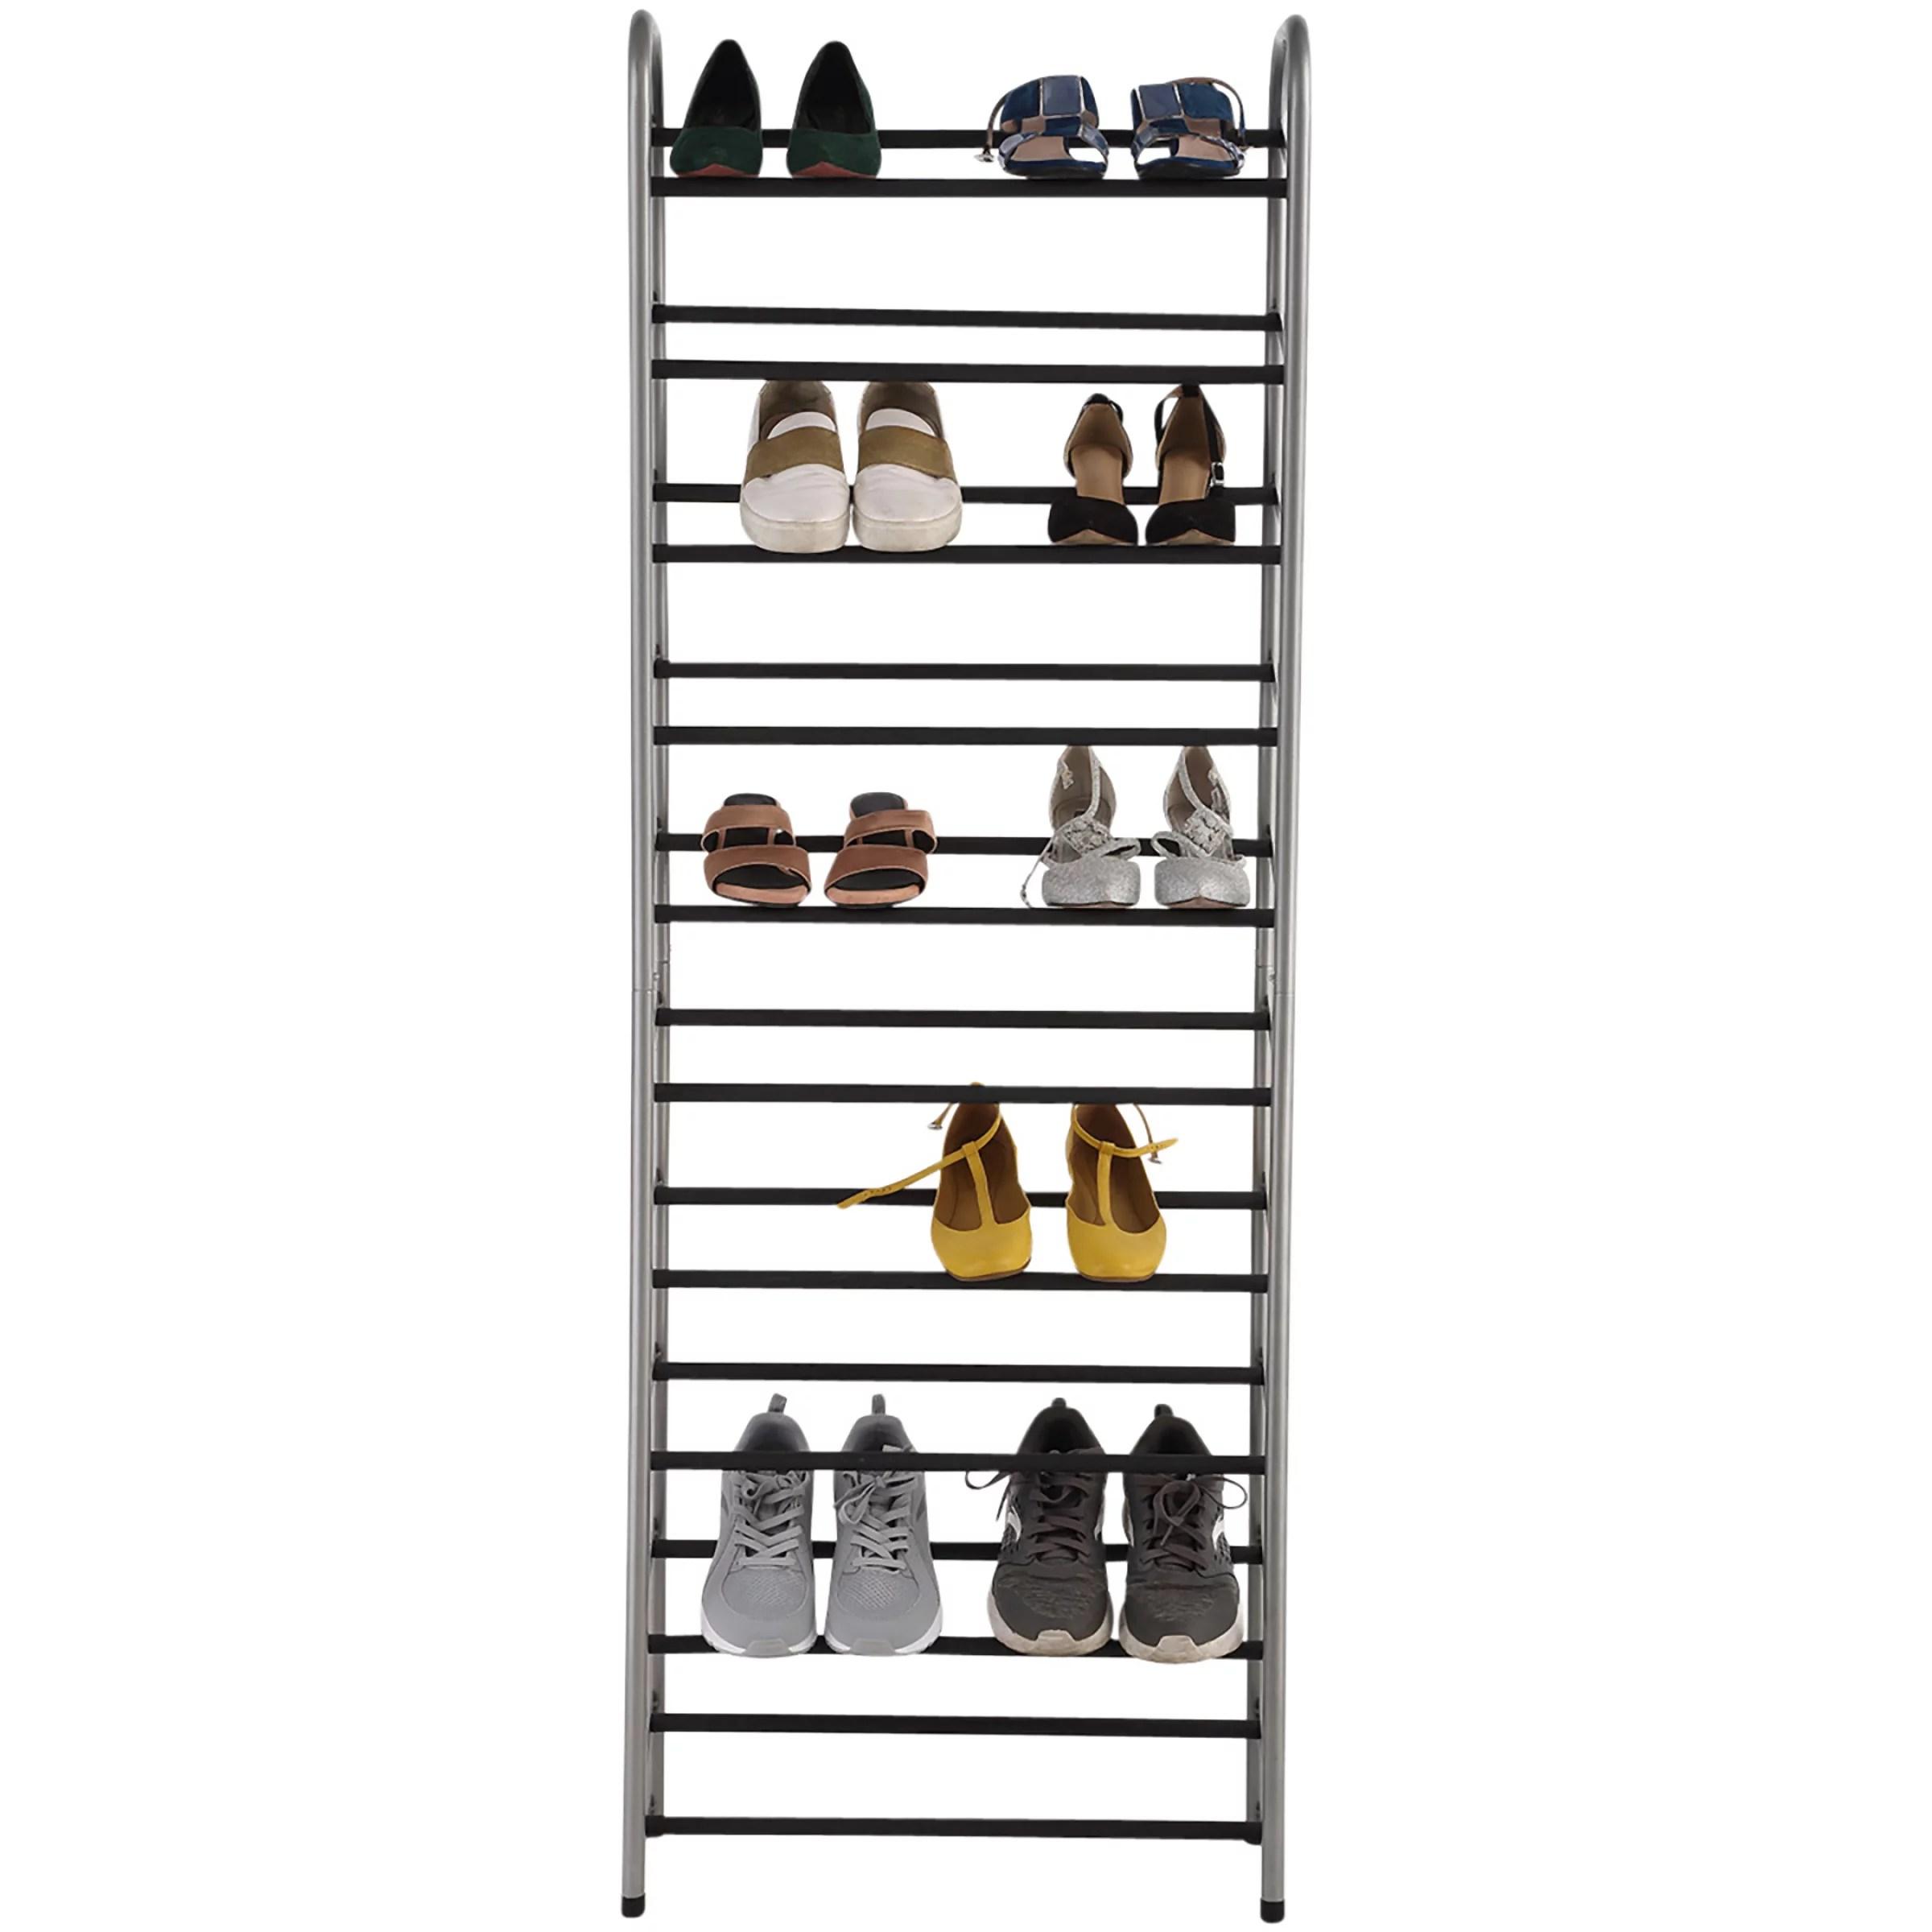 mainstays 10 tier narrow shoe rack powder coated black silver